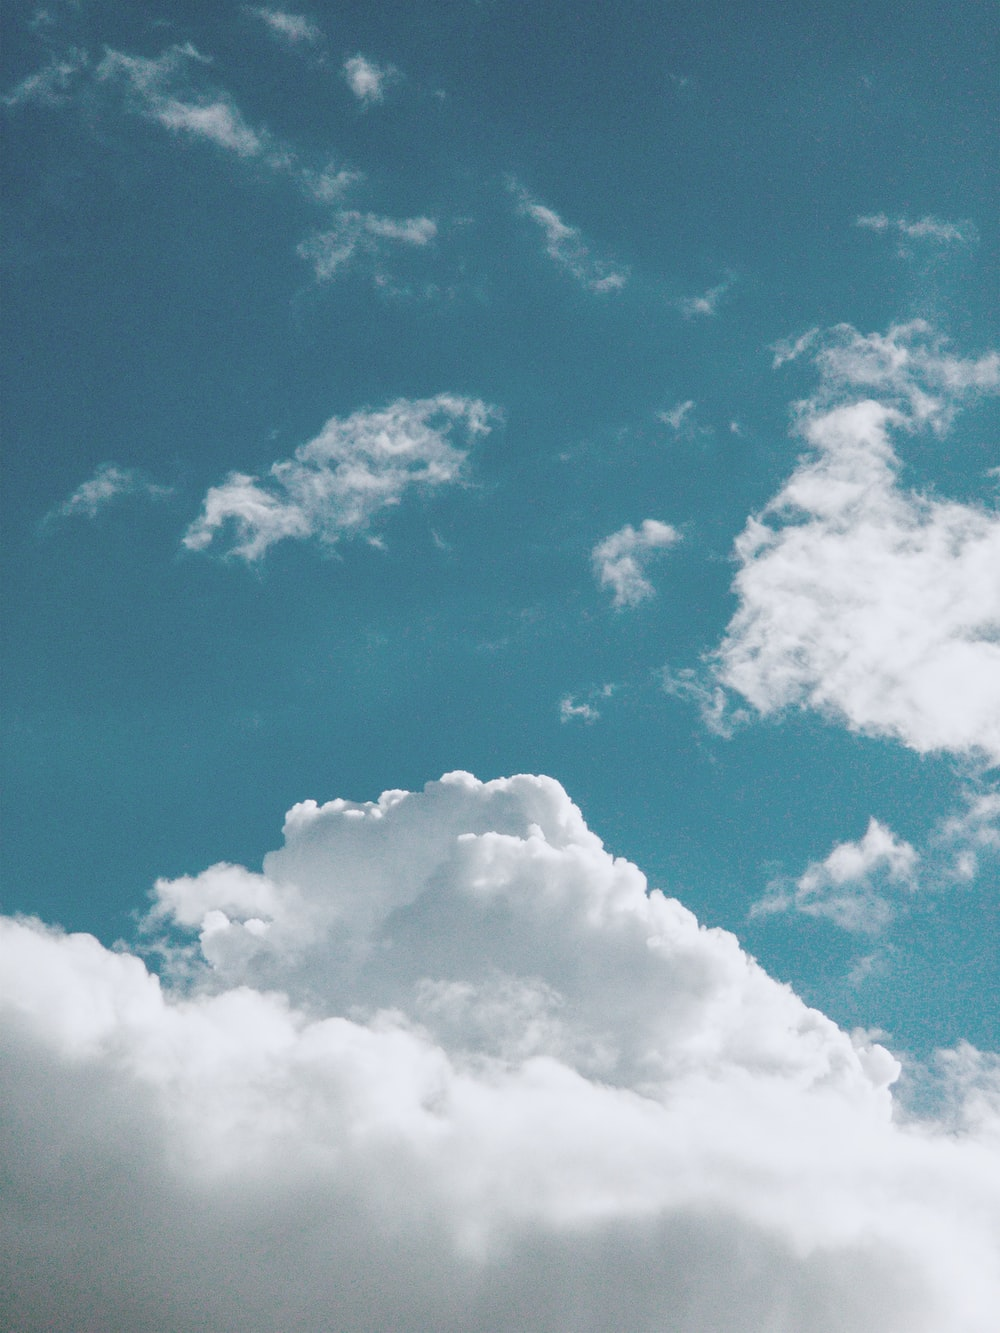 Sky Wallpapers Free HD Download [12+ HQ]   Unsplash